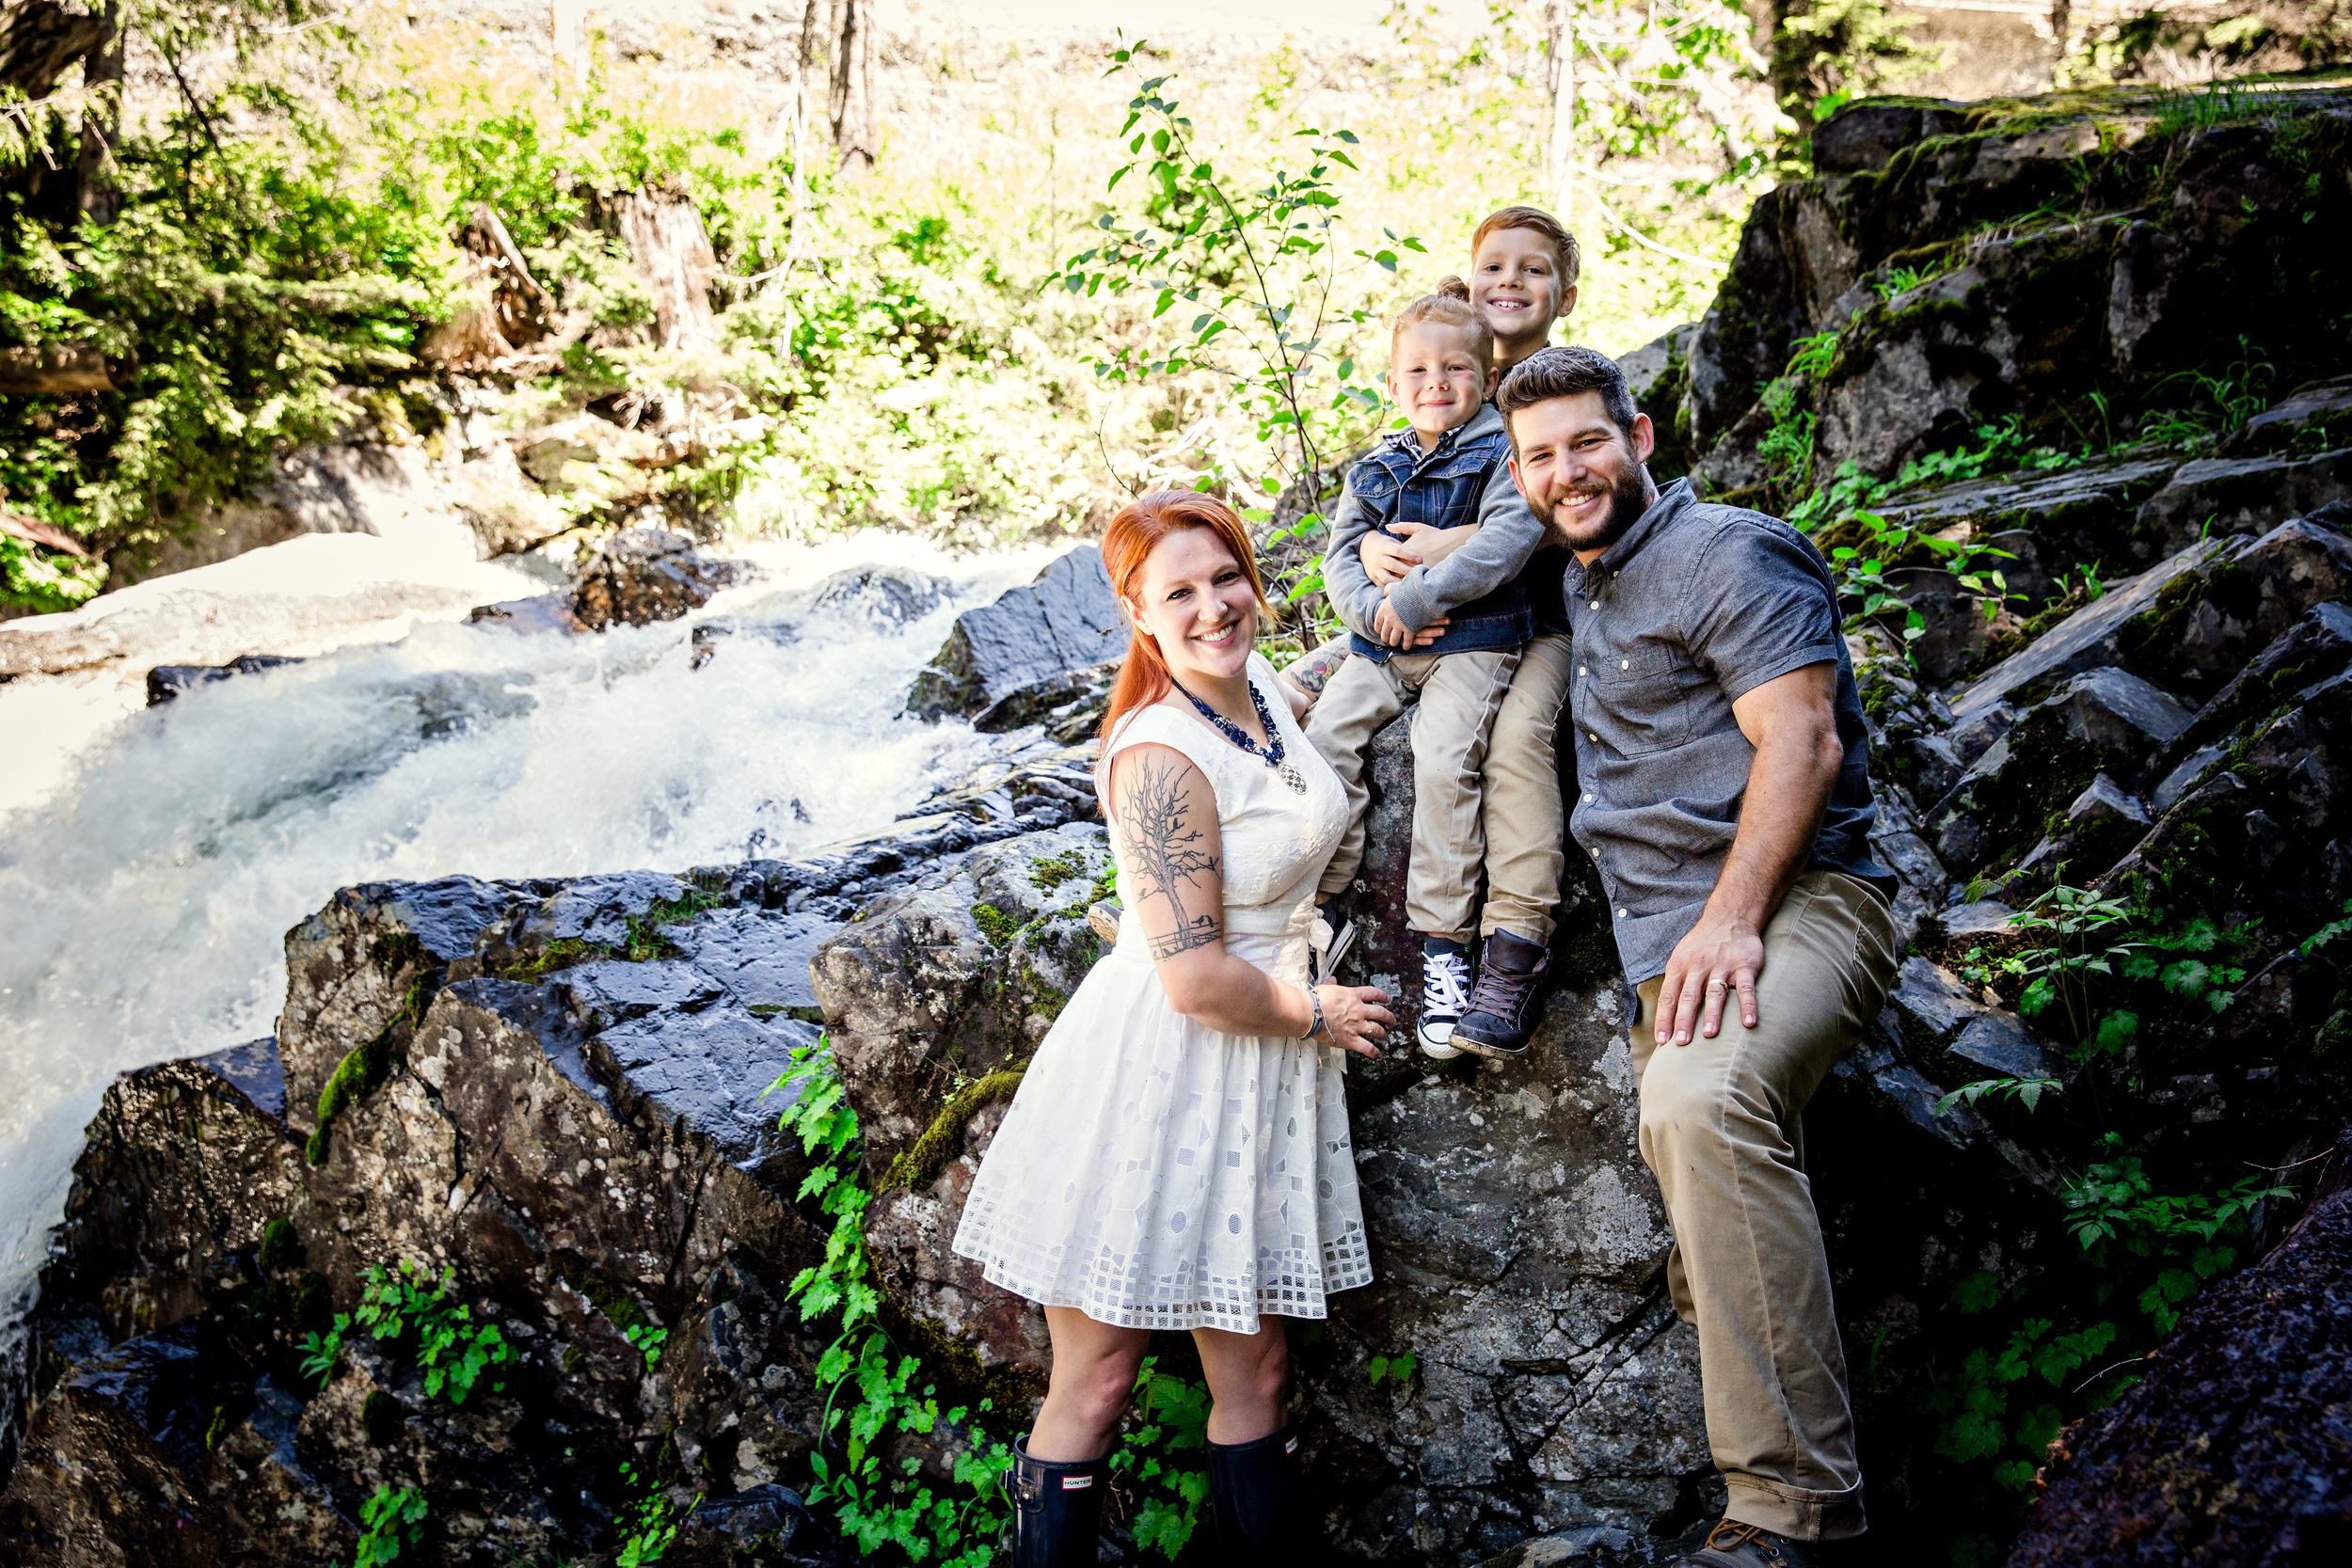 bryantfamily2016-06 (75 of 136).jpg